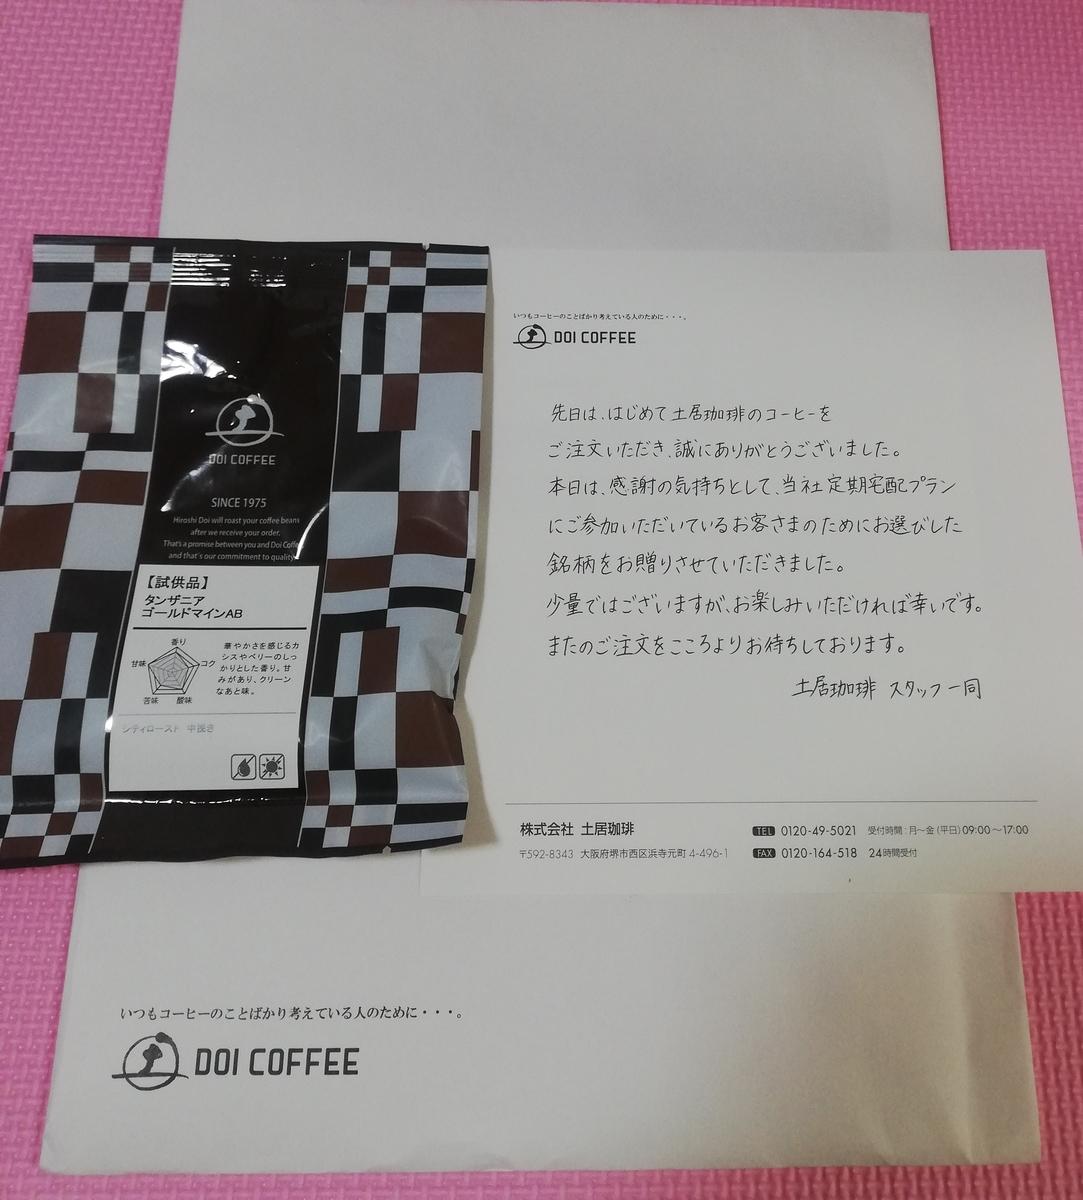 f:id:indo-coffeeholic:20200419180922j:plain